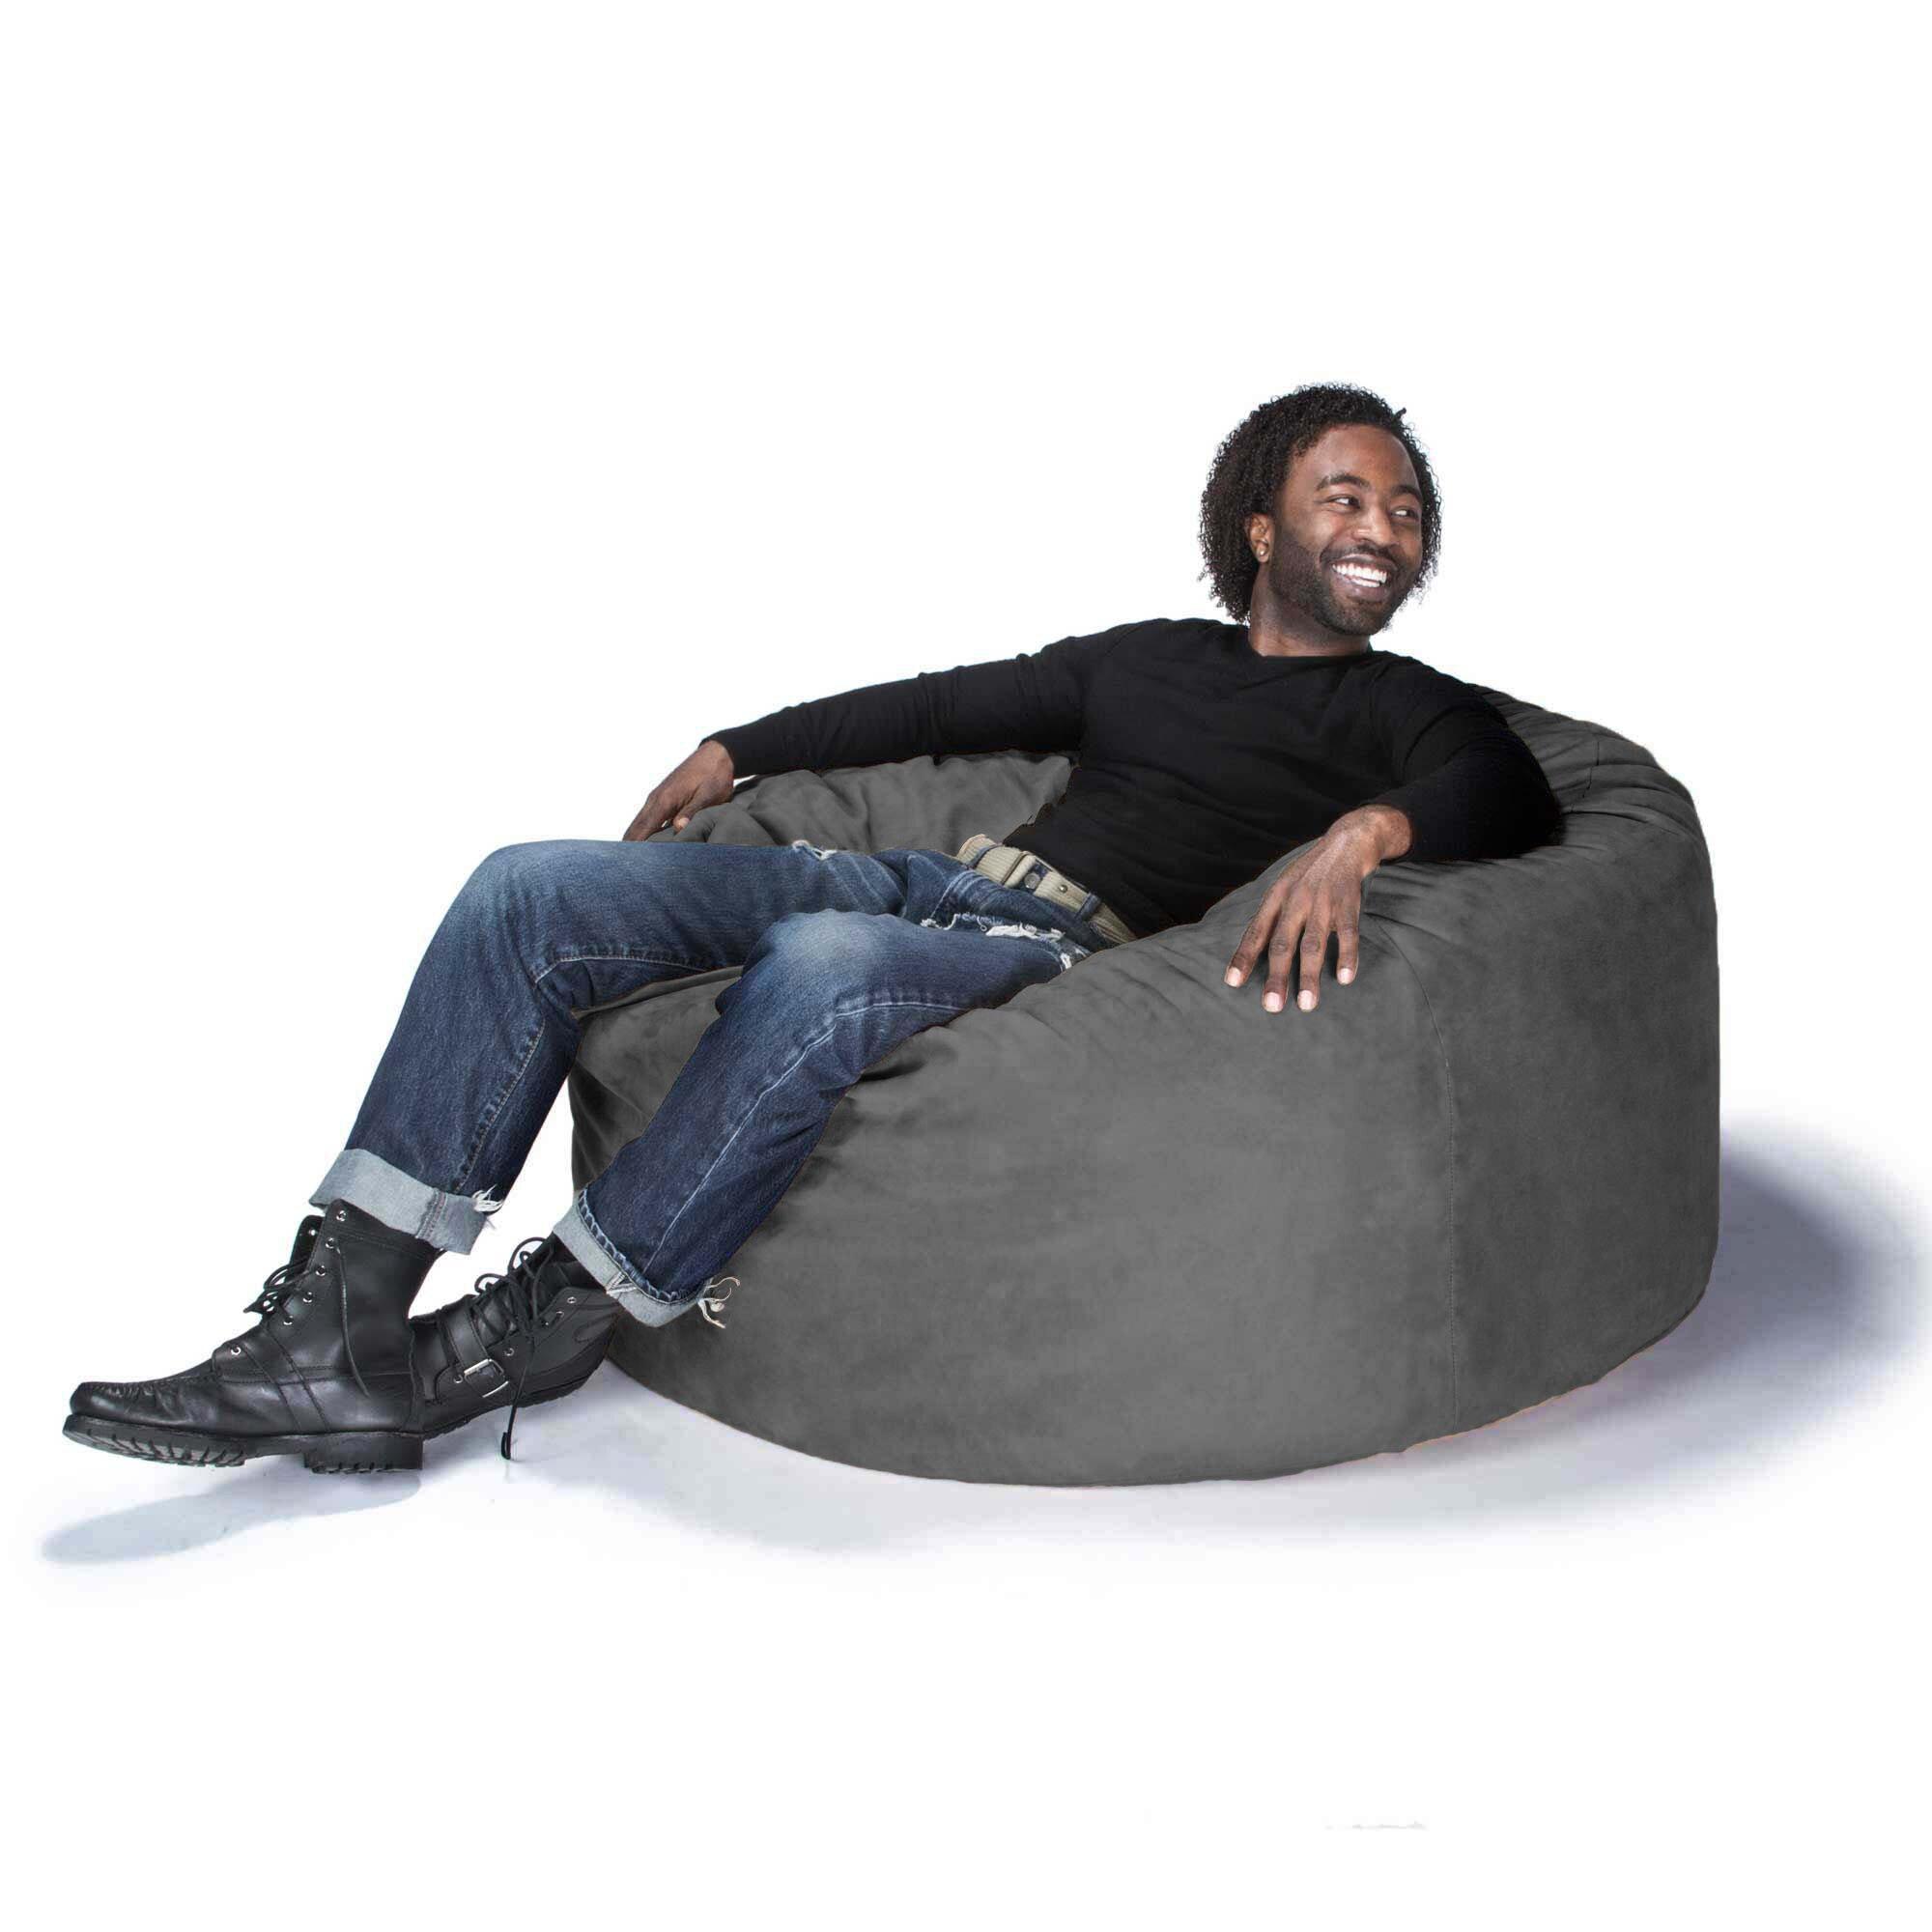 jaxx large bean bag gaming chair reviews. Black Bedroom Furniture Sets. Home Design Ideas